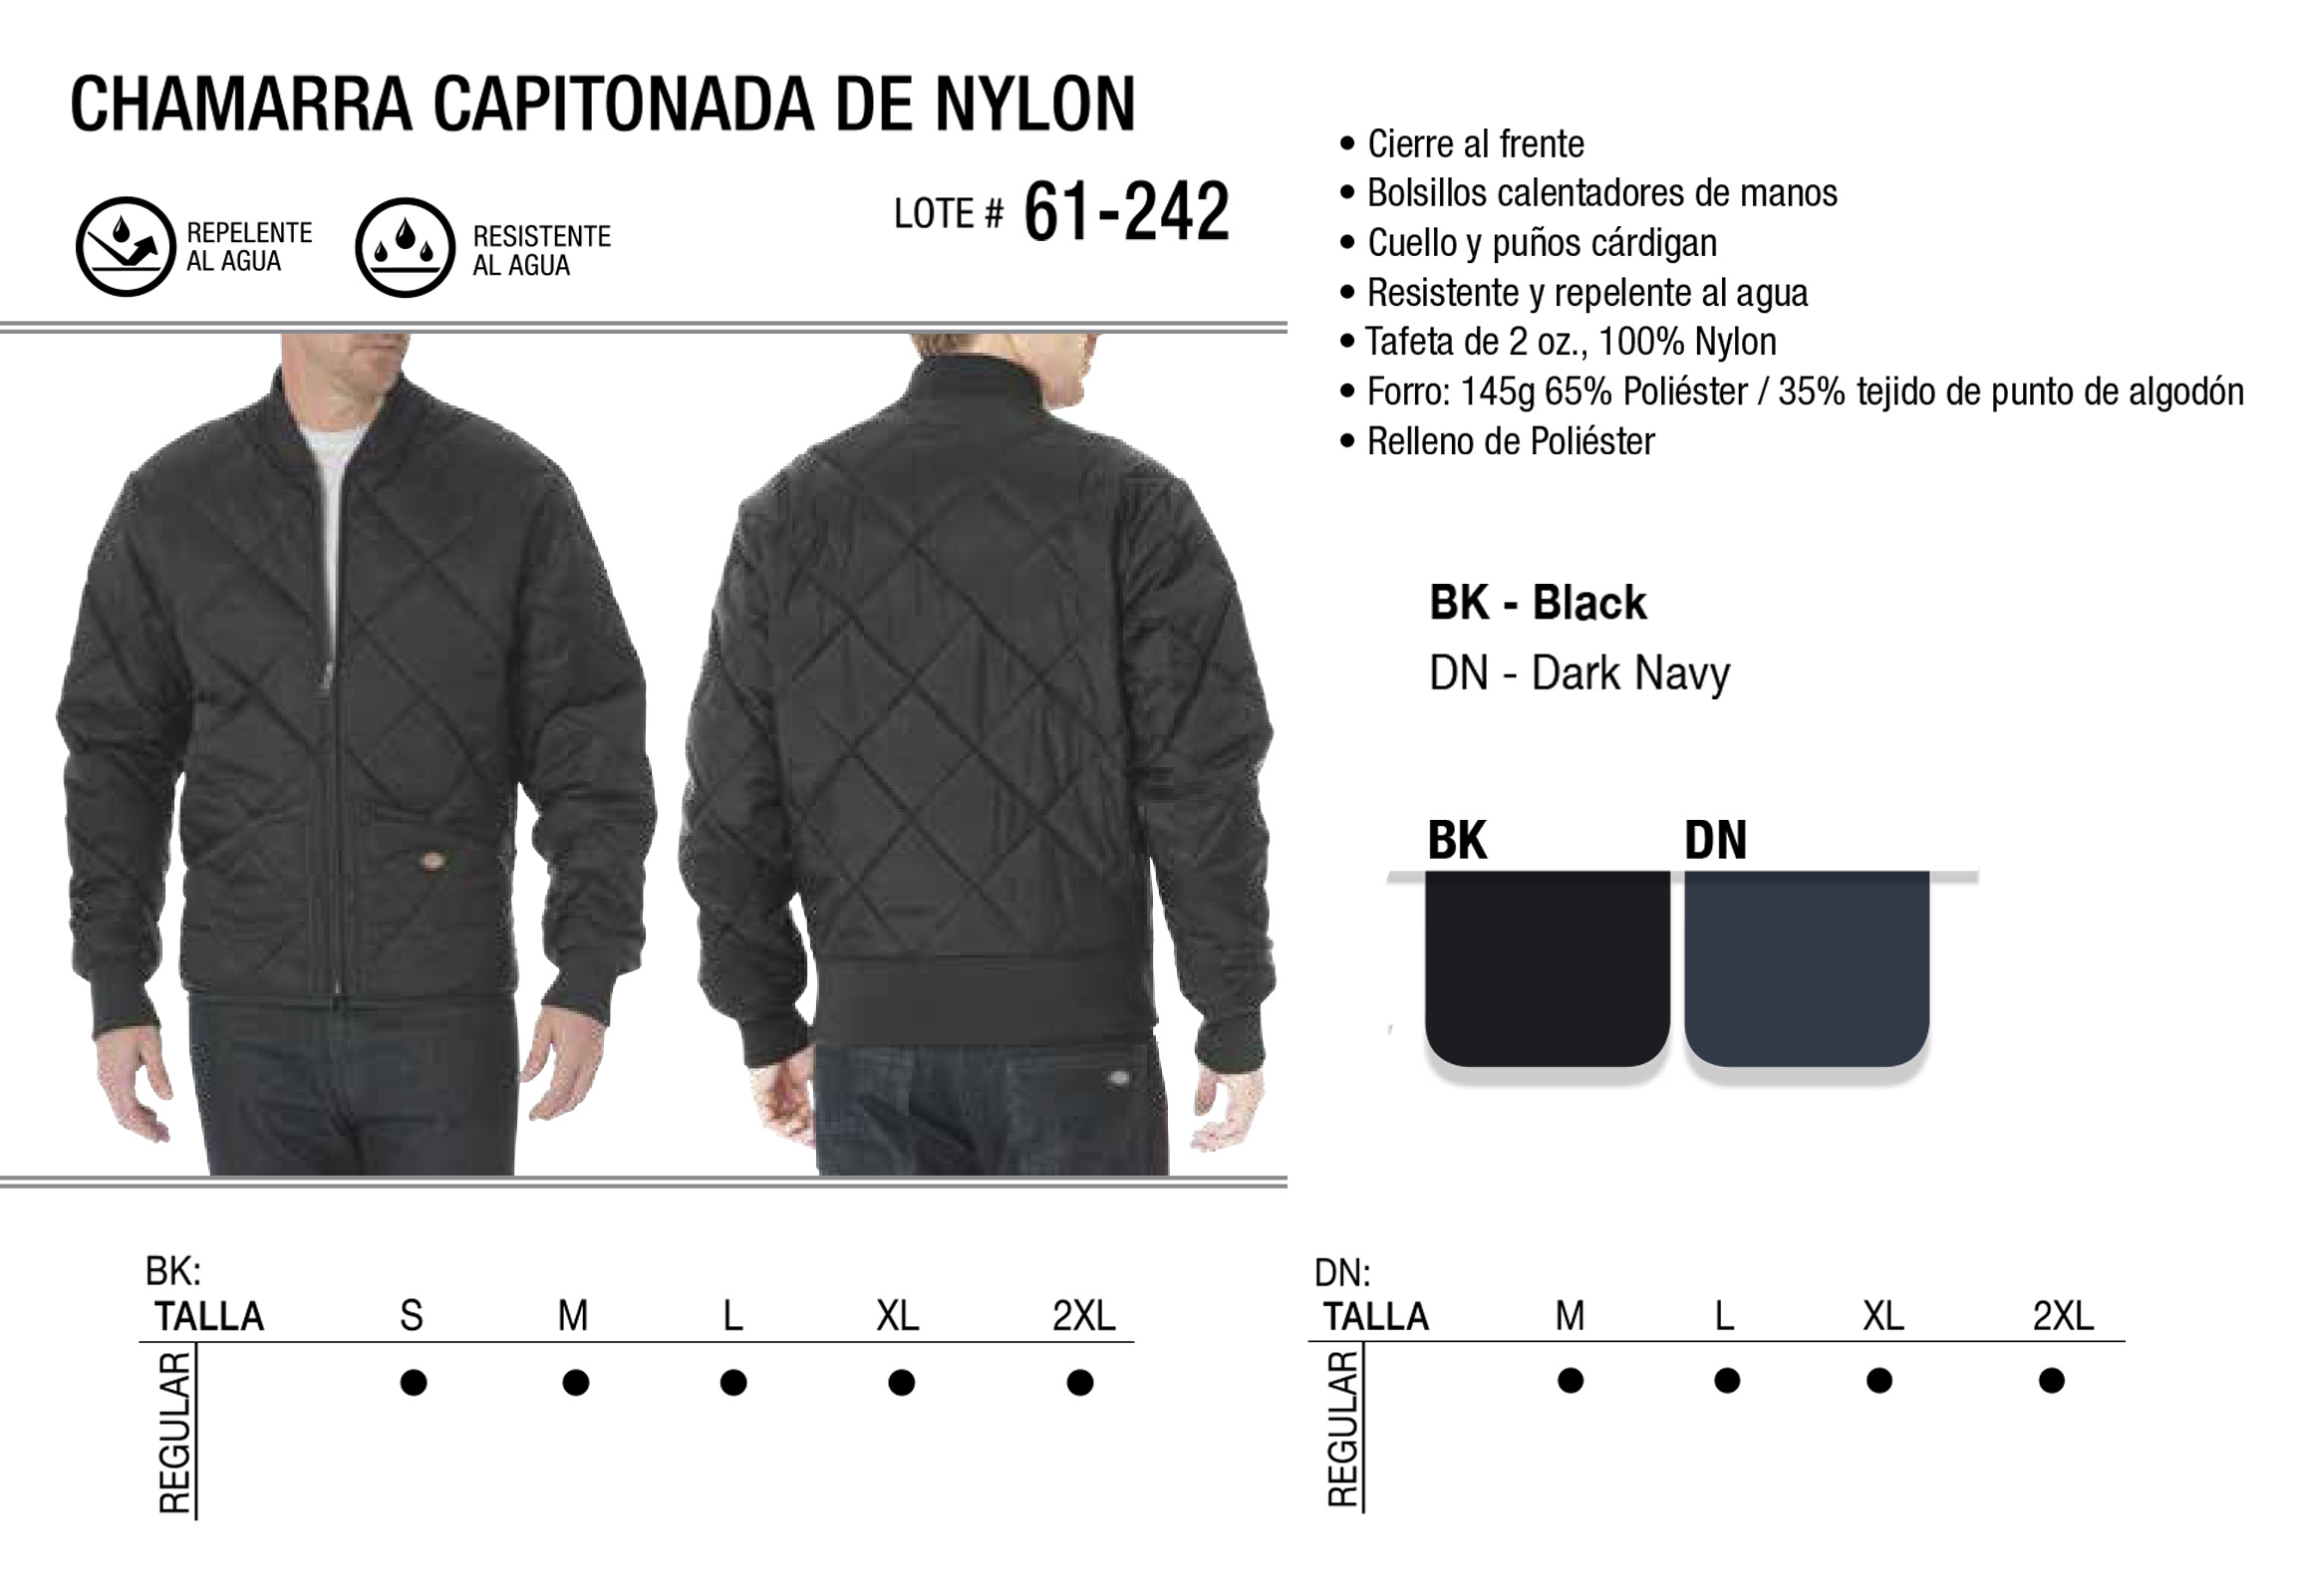 Chamarra Capitonada de Nylon. 61-242.